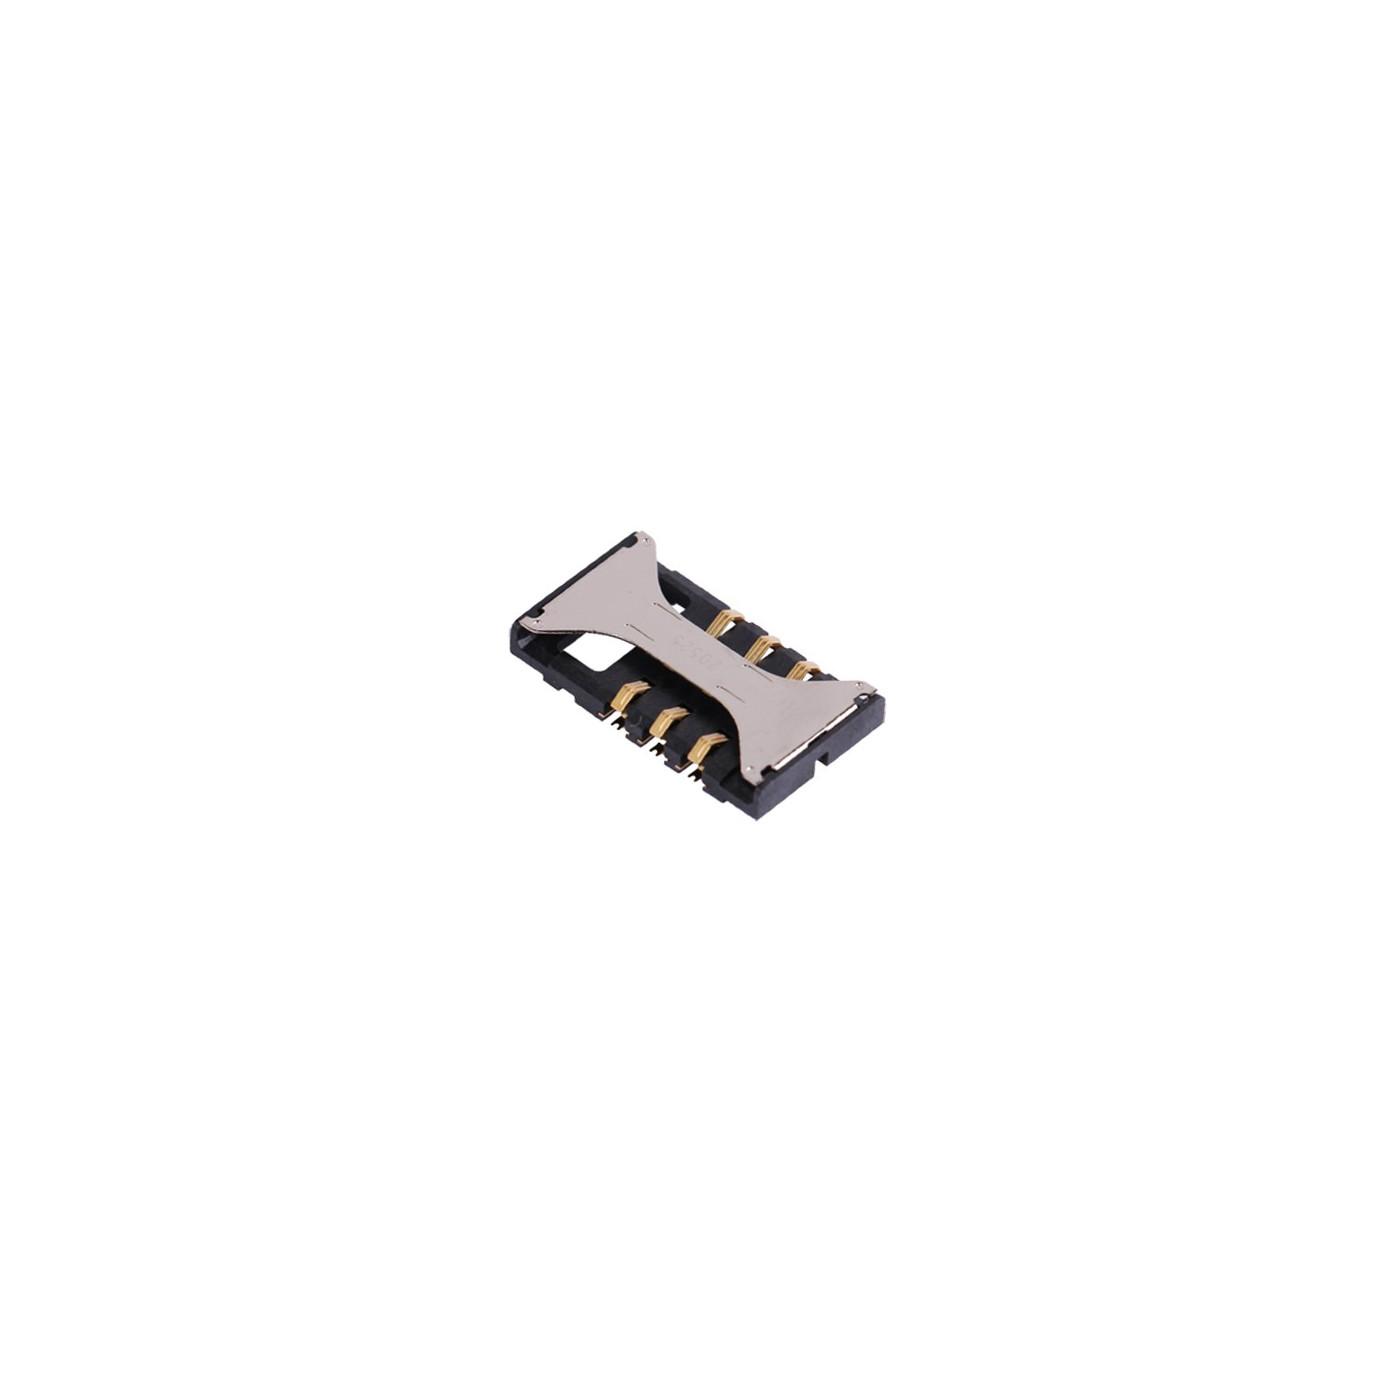 Player card slot sim card for Samsung Galaxy Ace S5830